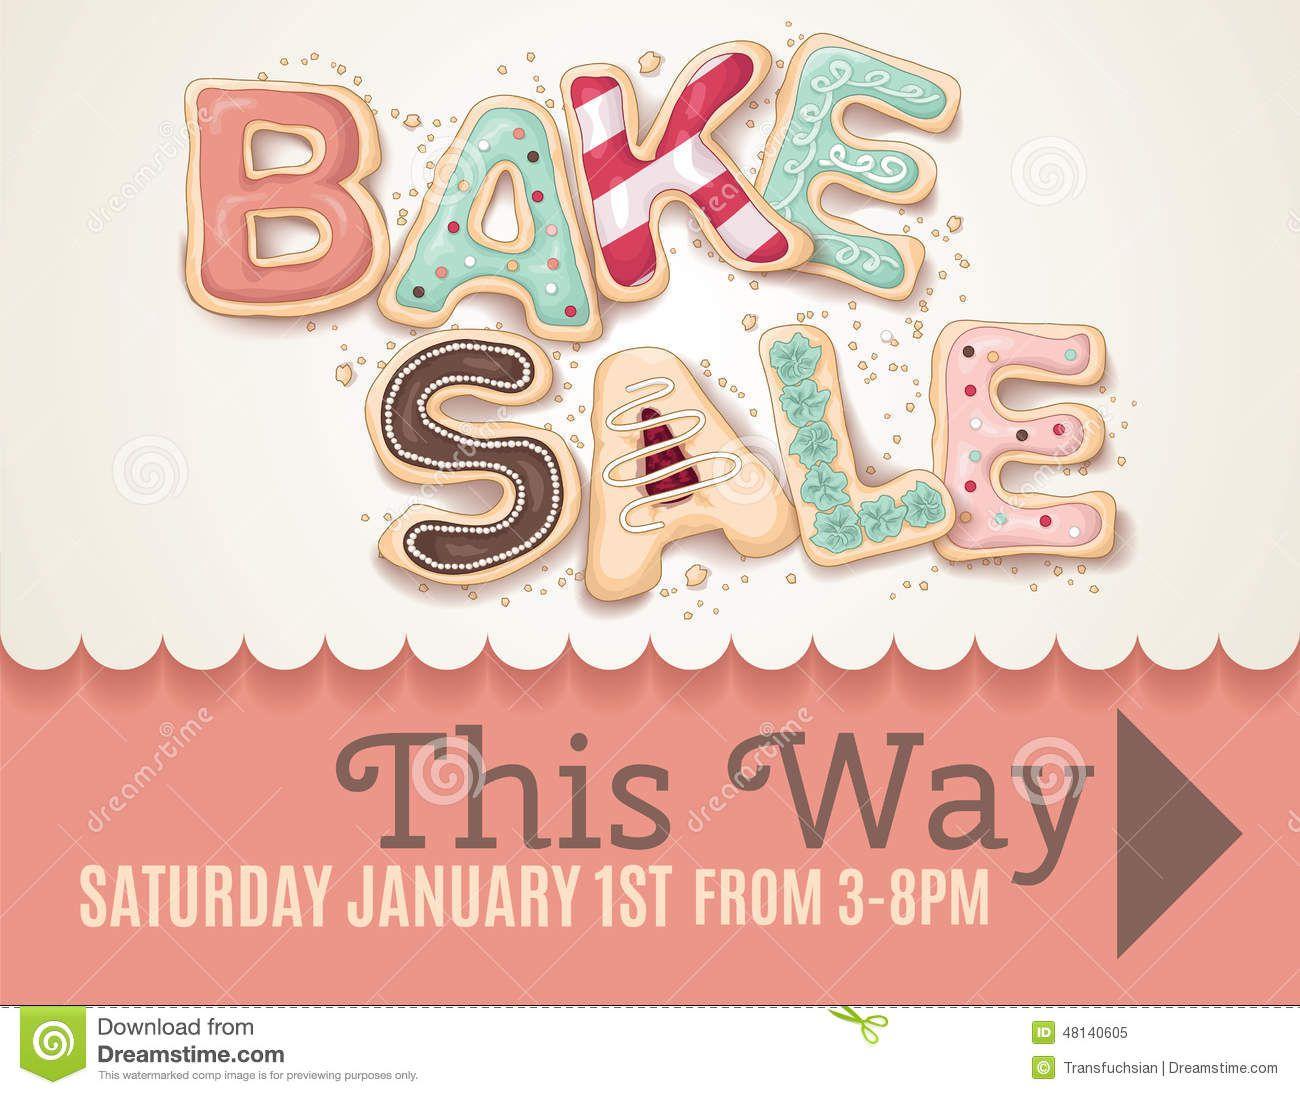 007 Remarkable Valentine Bake Sale Flyer Template Free High Def  Valentine'Full